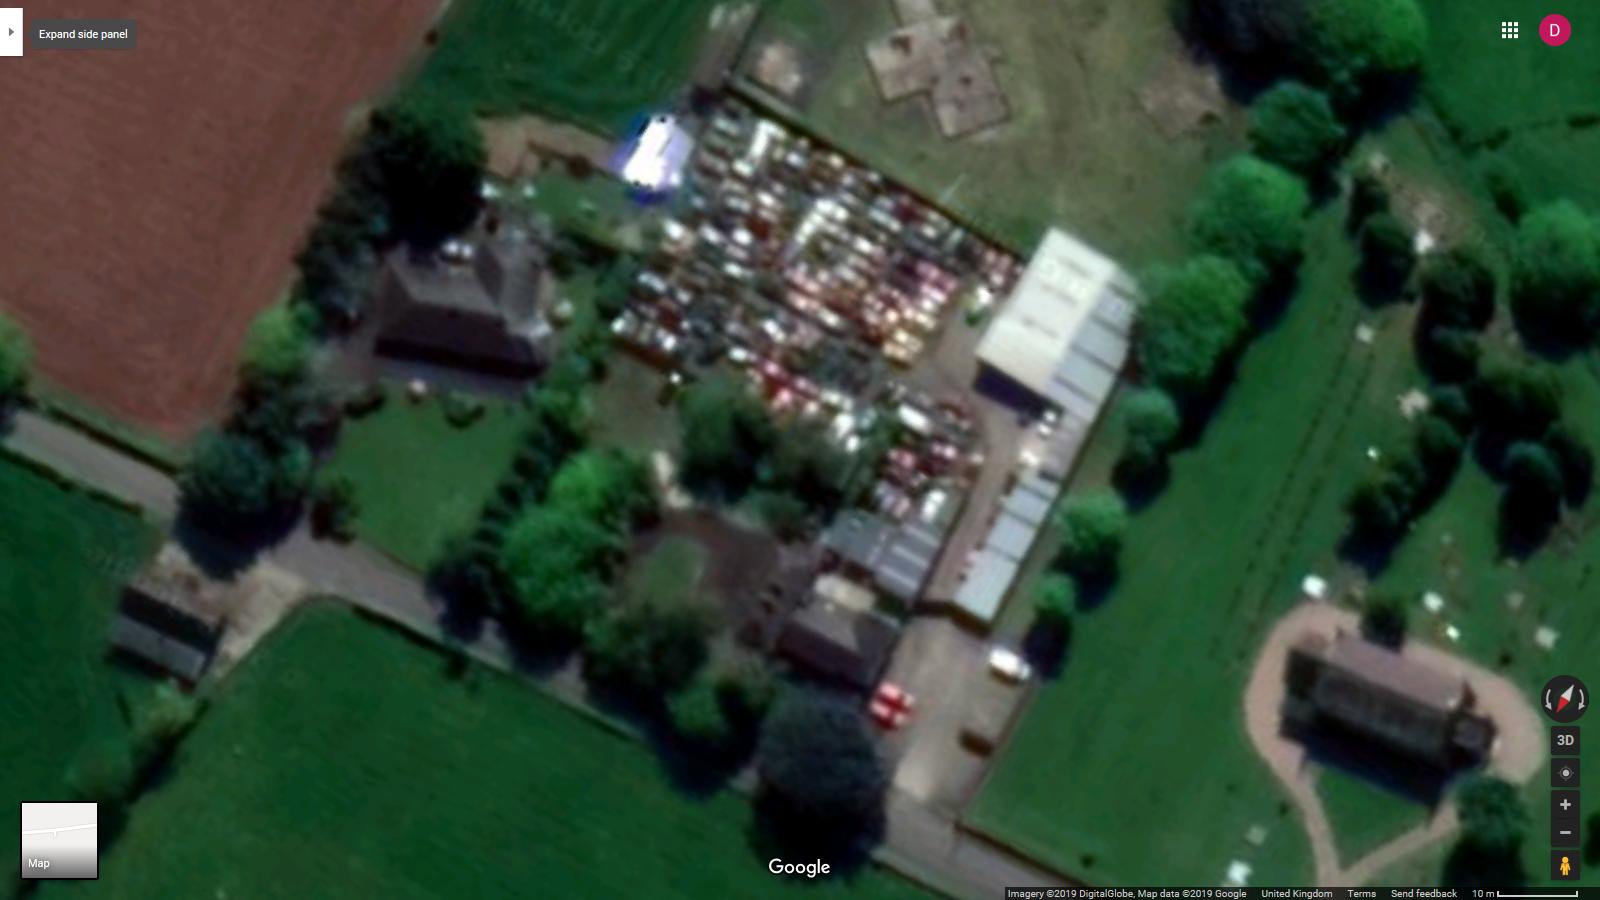 Junkyard Jewels - 28 Ardtrea Rd, Stewartstown - Google Aerial View.png